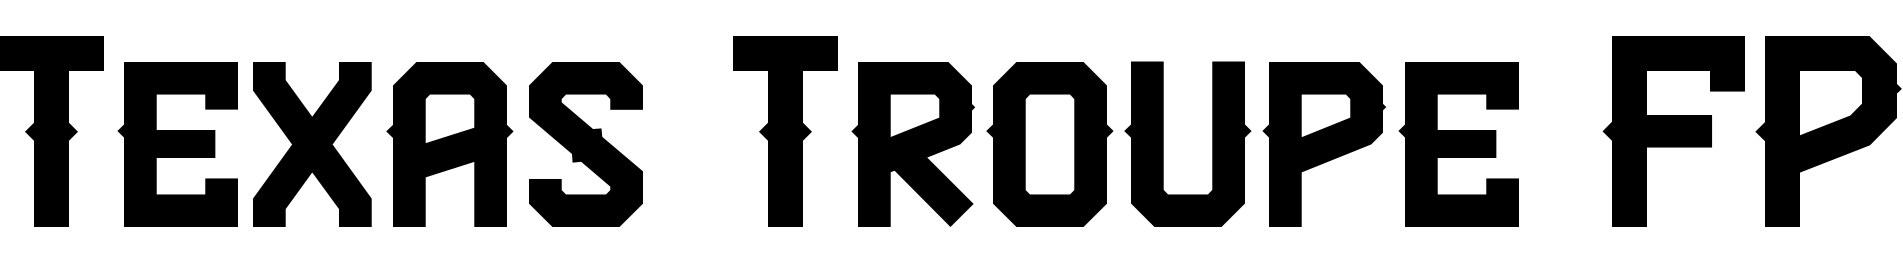 Texas Troupe FP